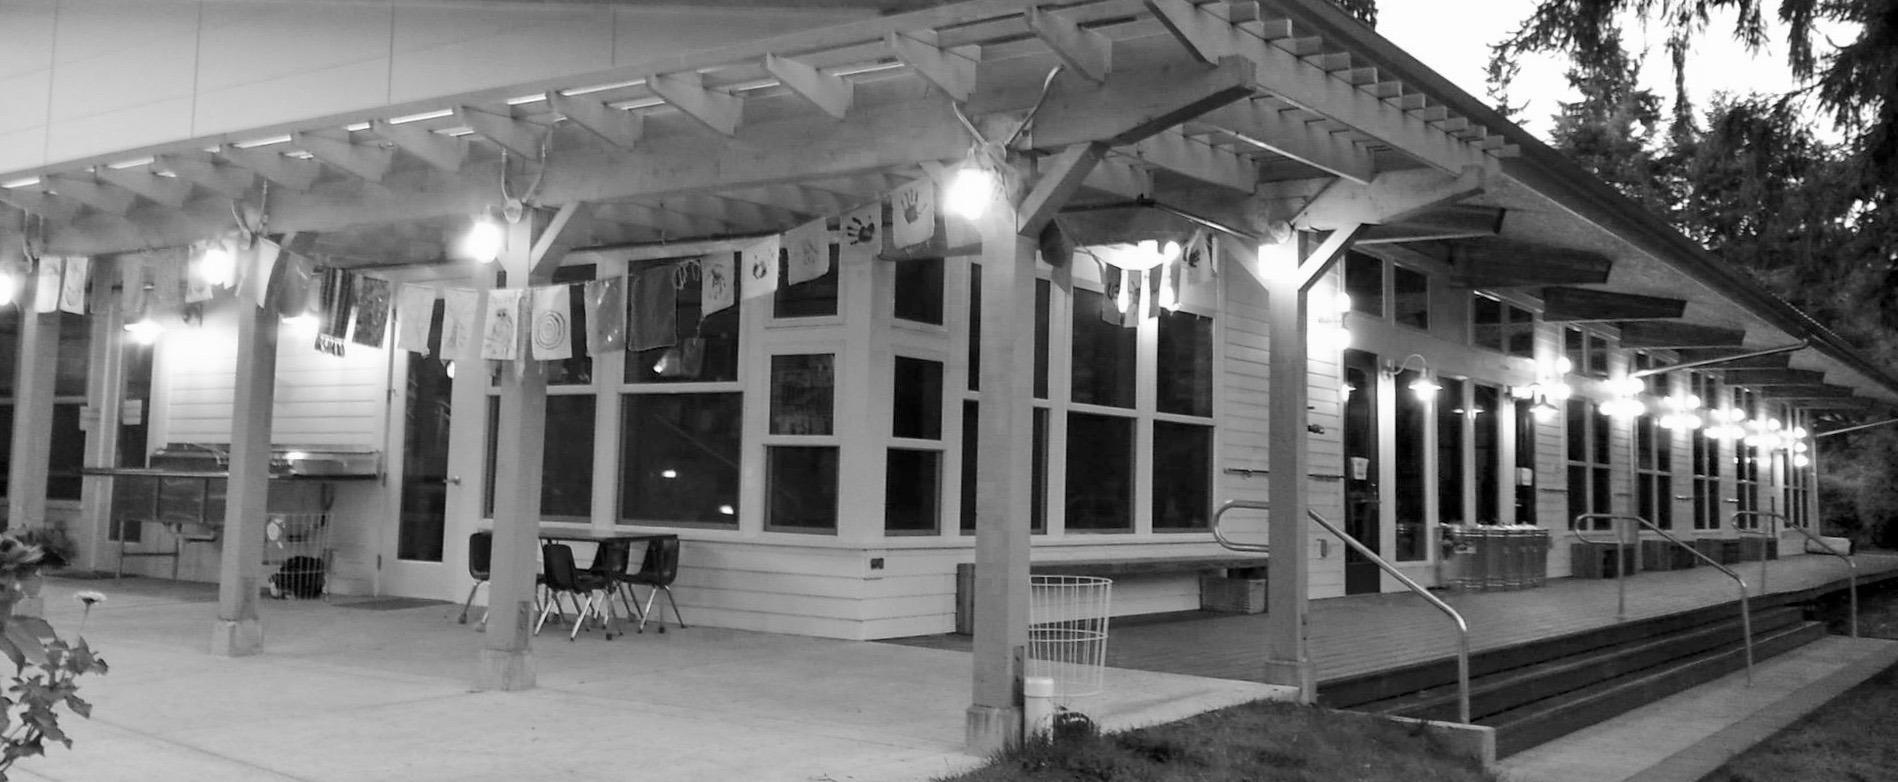 Attic building at night